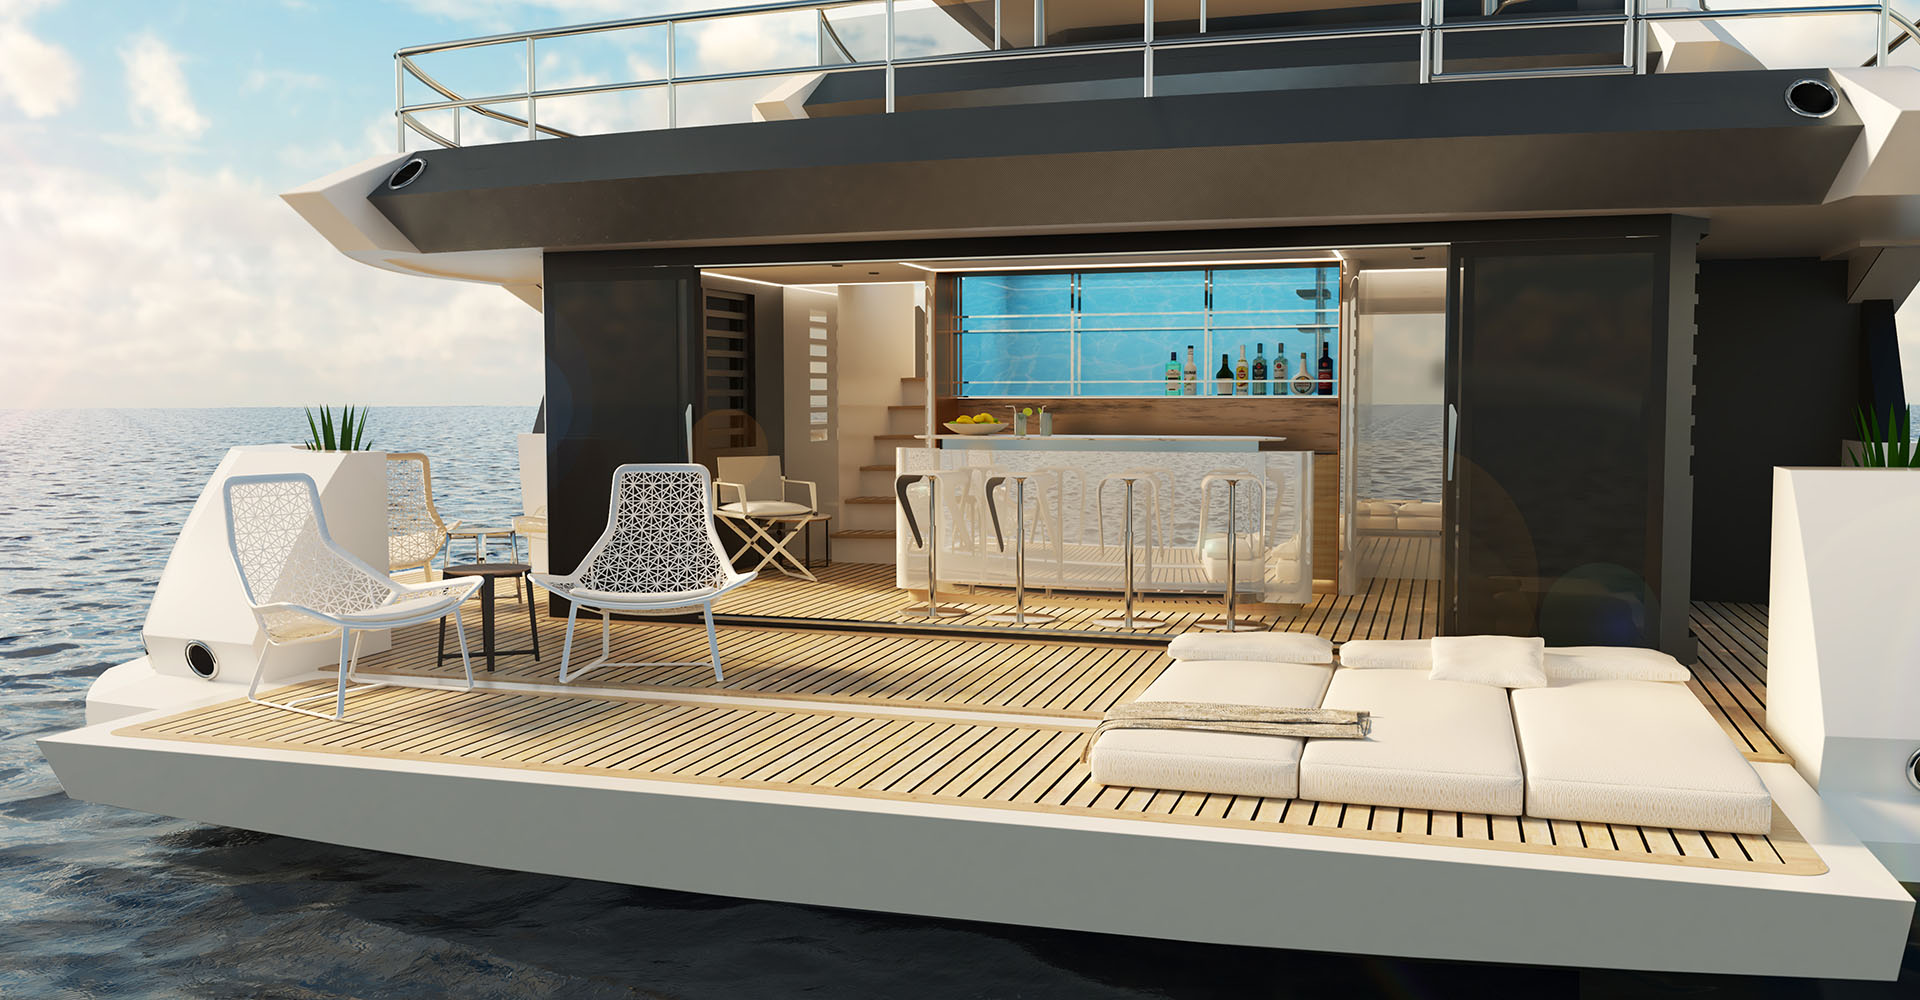 The beachclub design for Sunseeker's 161 superyacht